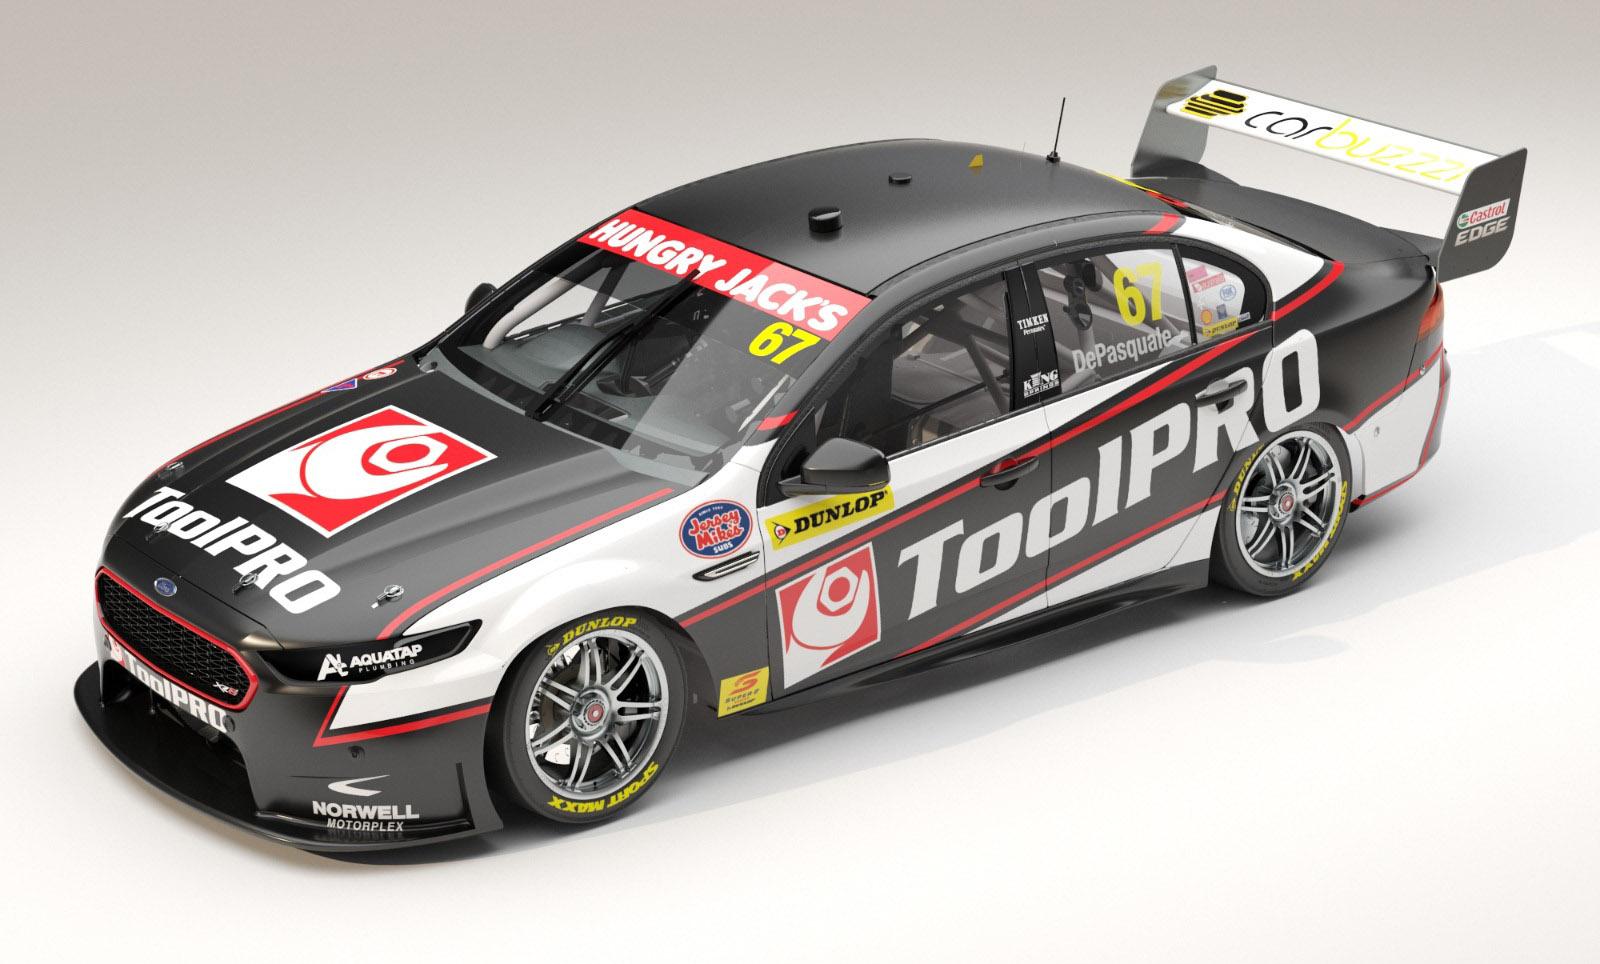 Anton DePasquale Ford Falcon FG-X Paul Morris Motorsport